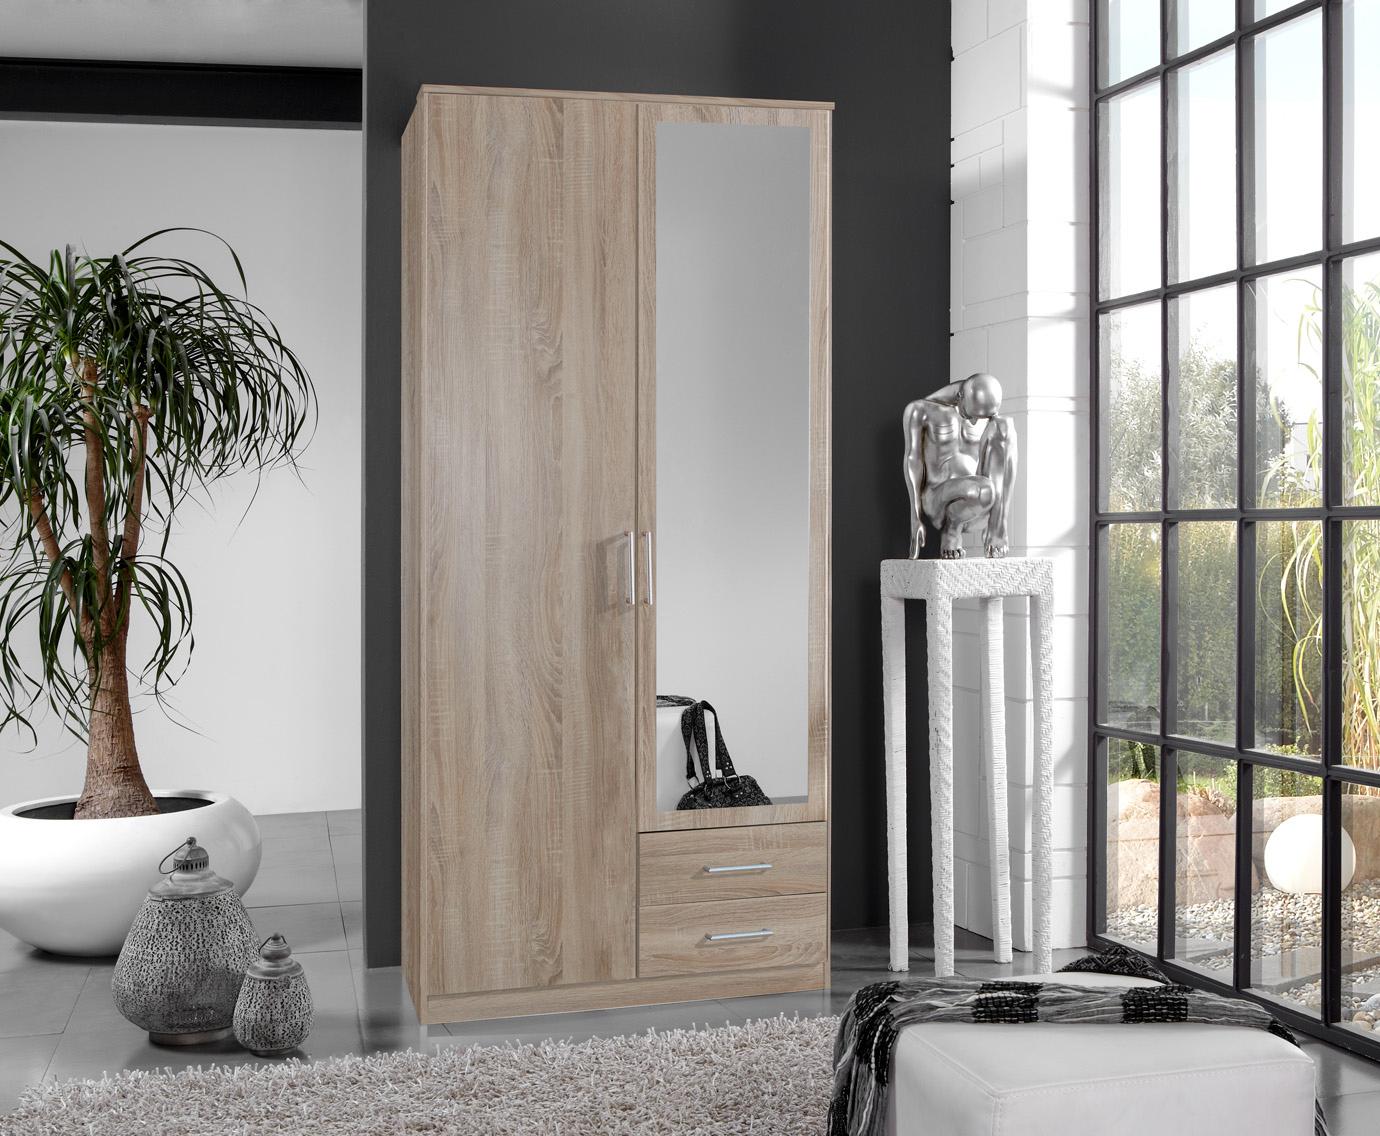 Armoire contemporaine 2 portes/2 tiroirs coloris chêne Carola